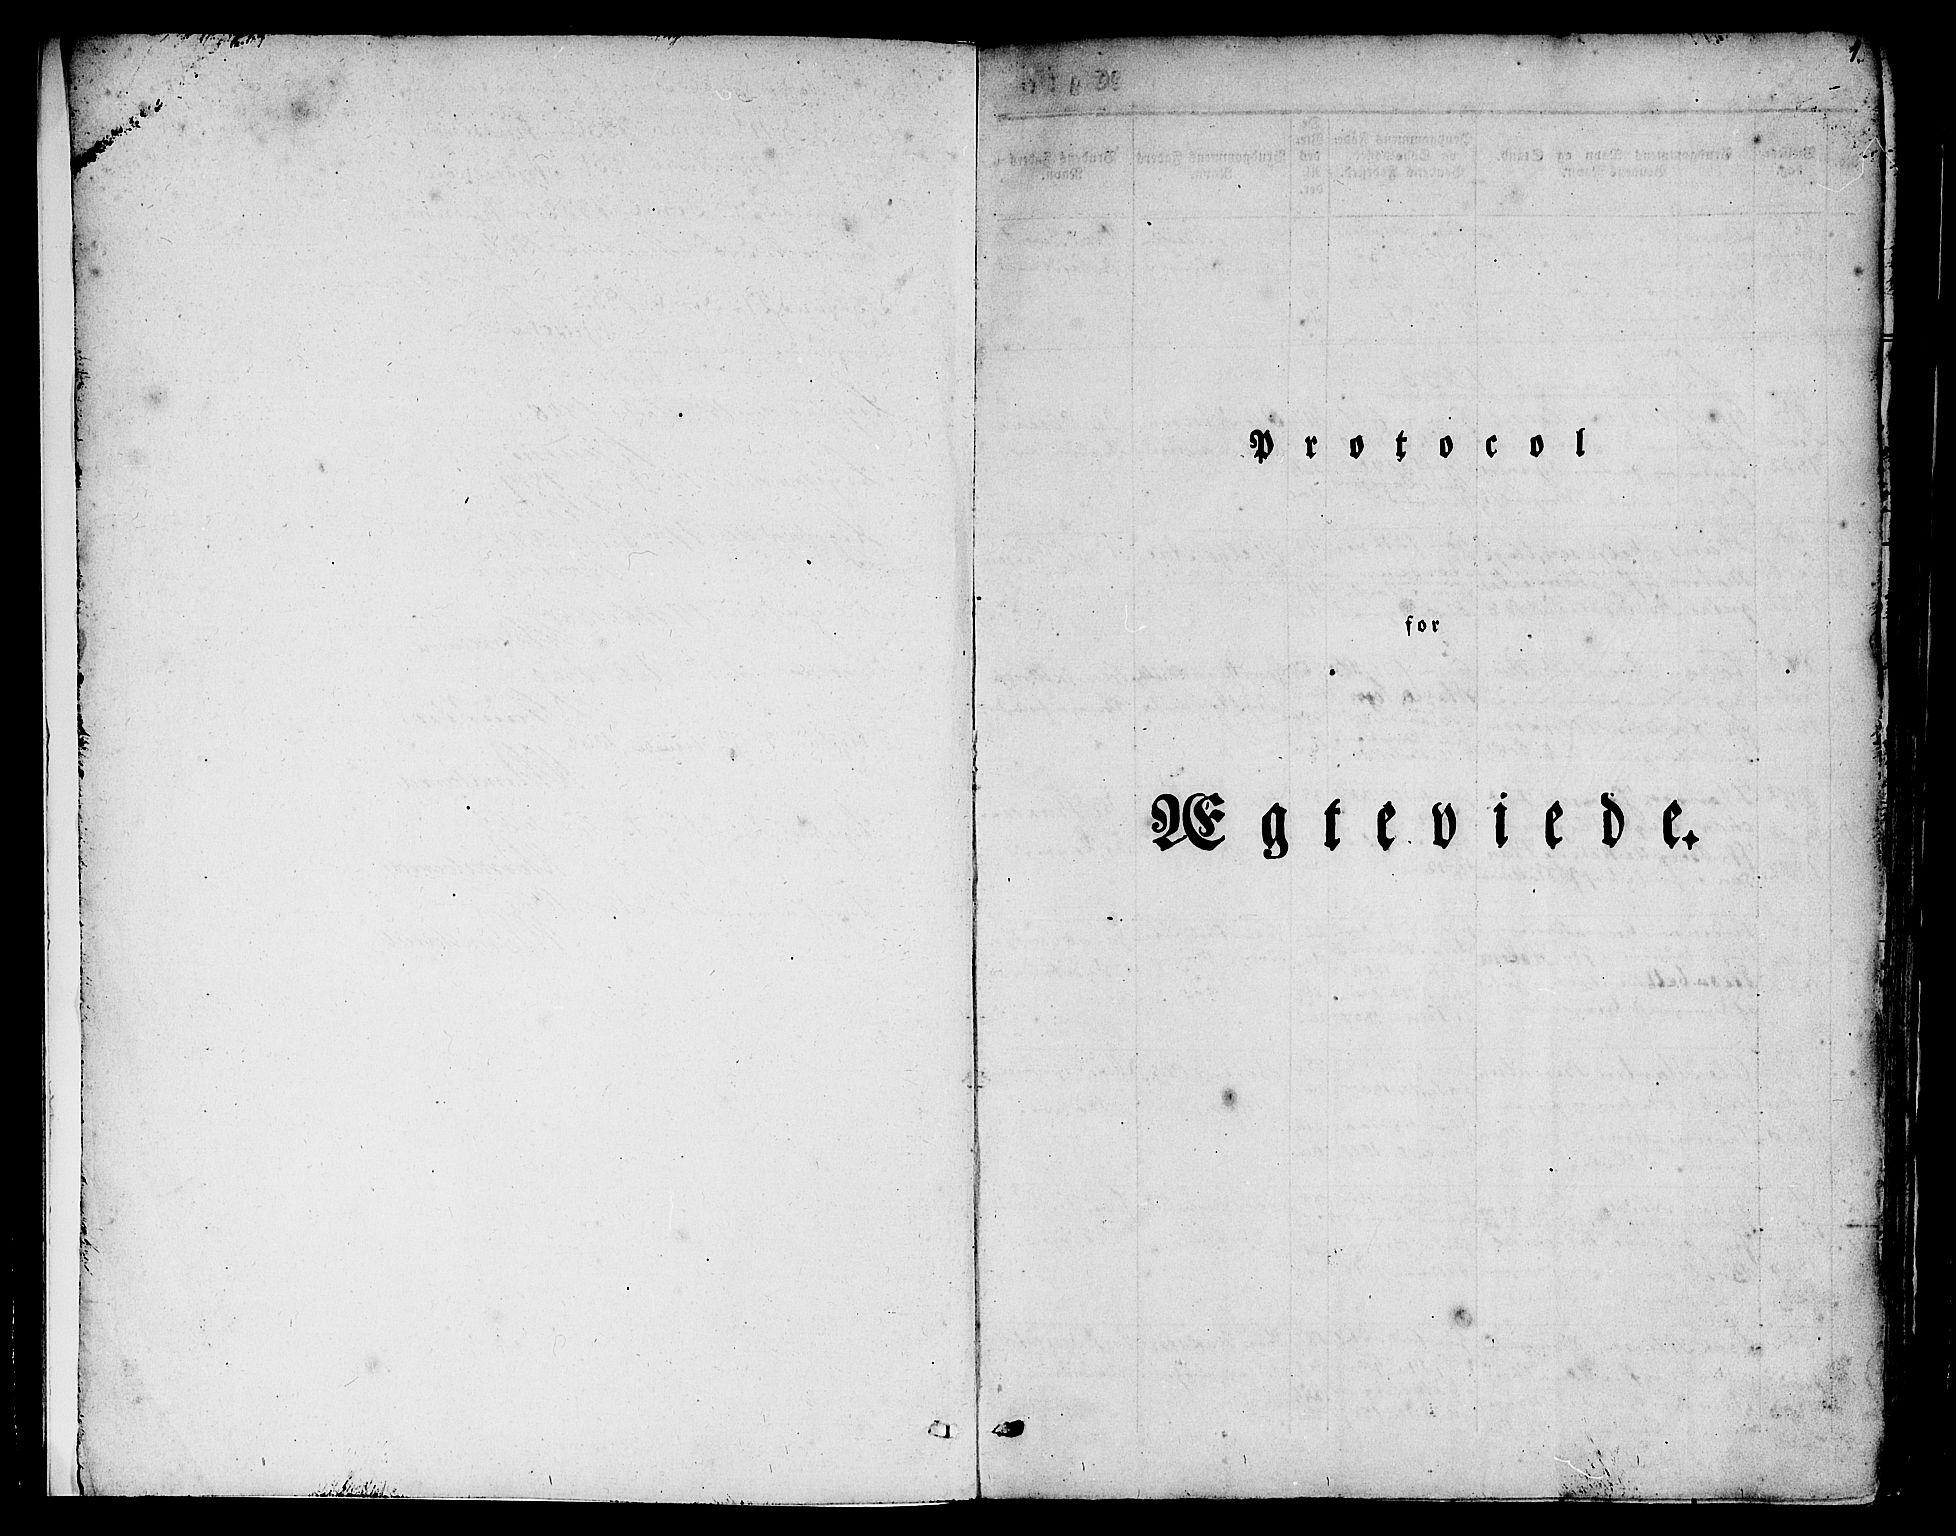 SAB, Nykirken Sokneprestembete, H/Hab: Klokkerbok nr. D 1, 1832-1867, s. 1